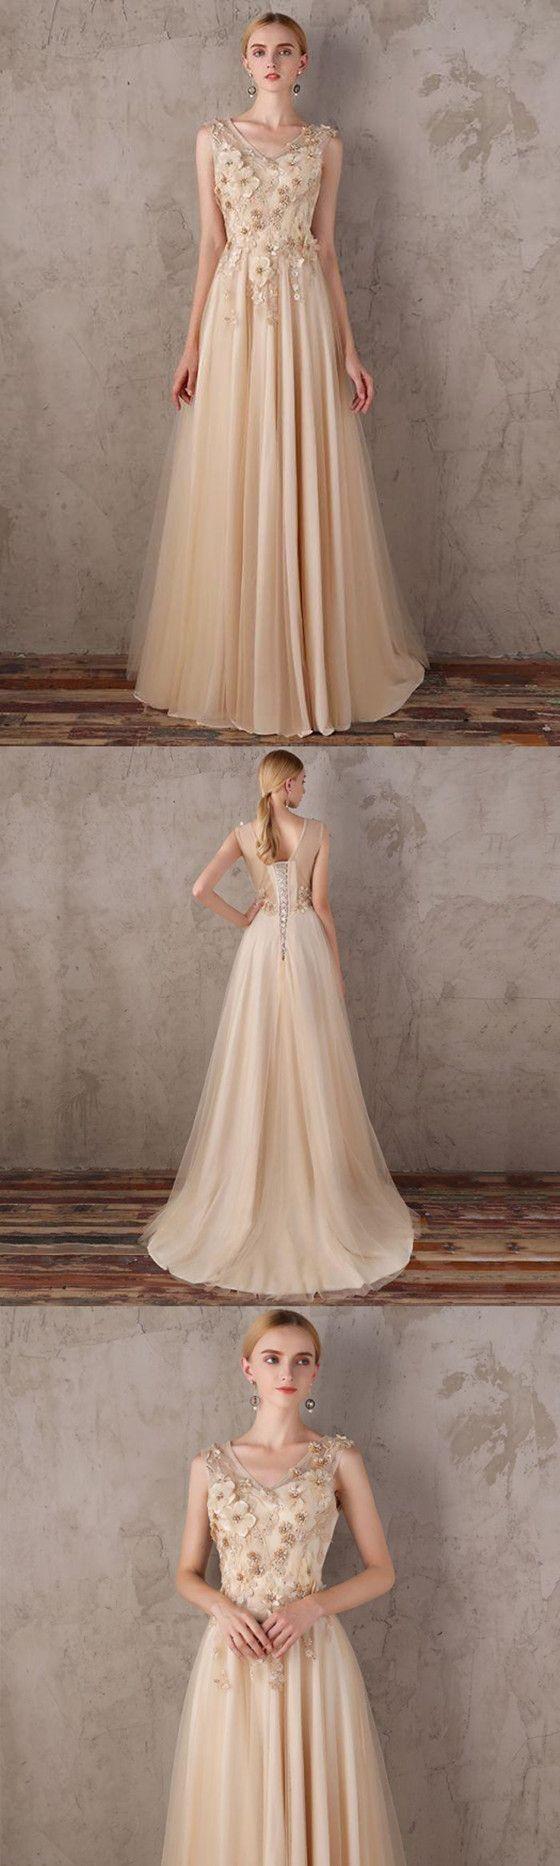 24 best kleider images on Pinterest | Ball gown, Long evening ...